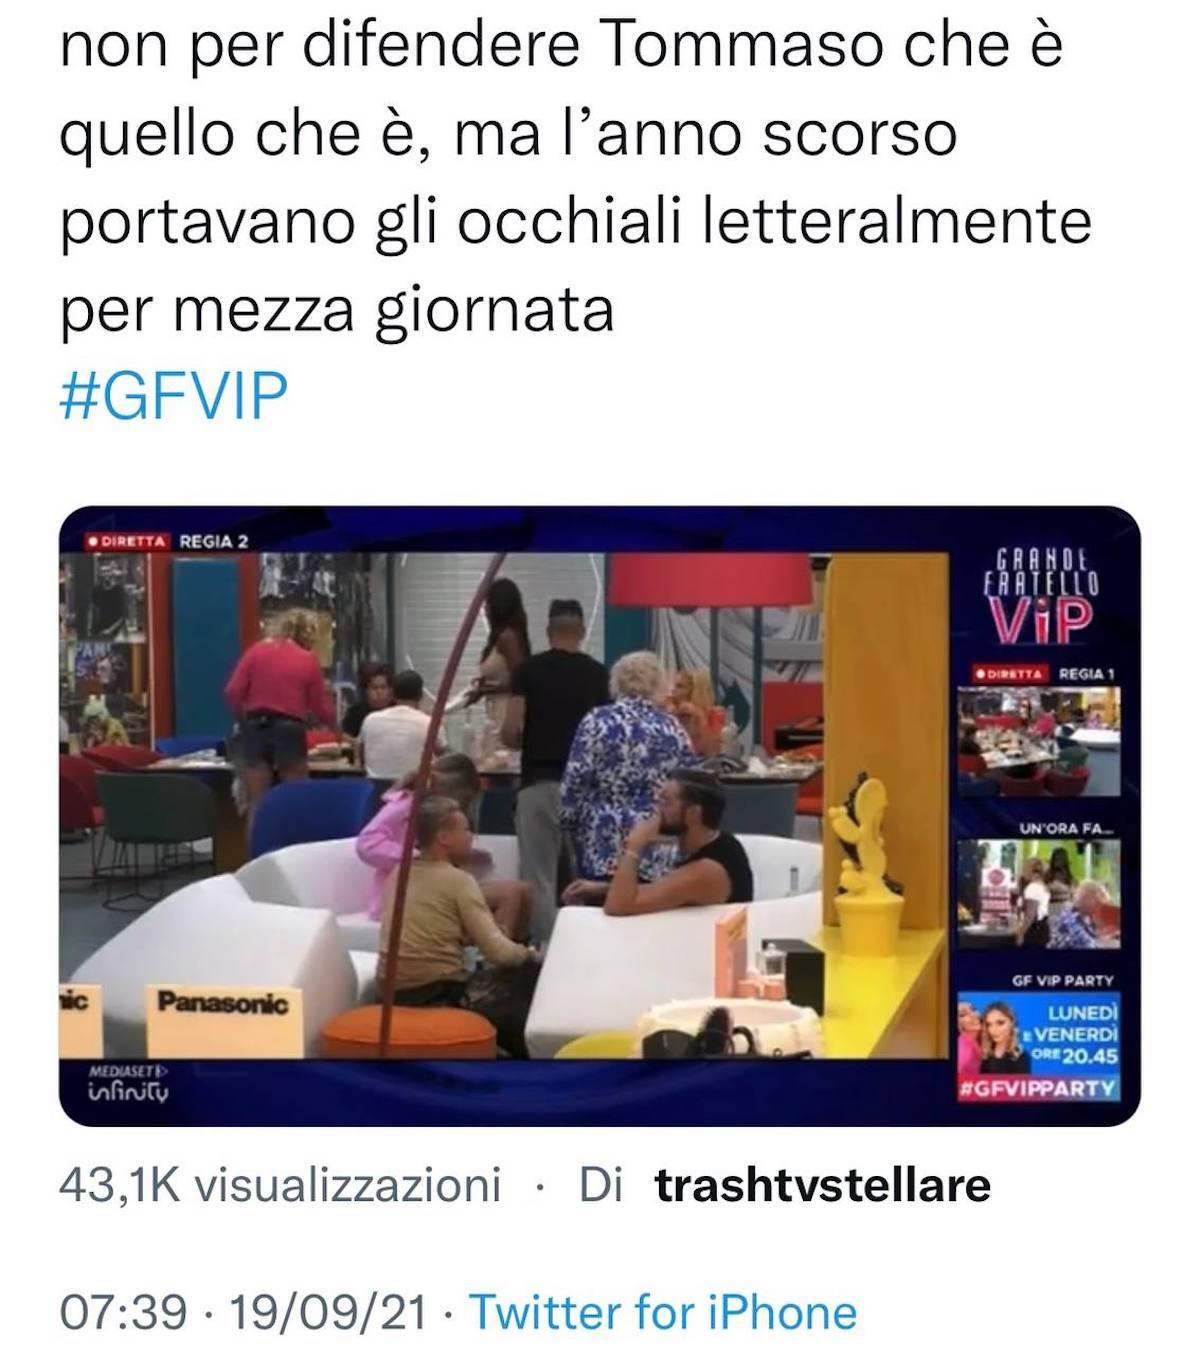 Tommaso Eletti gf vip 6 occhiali